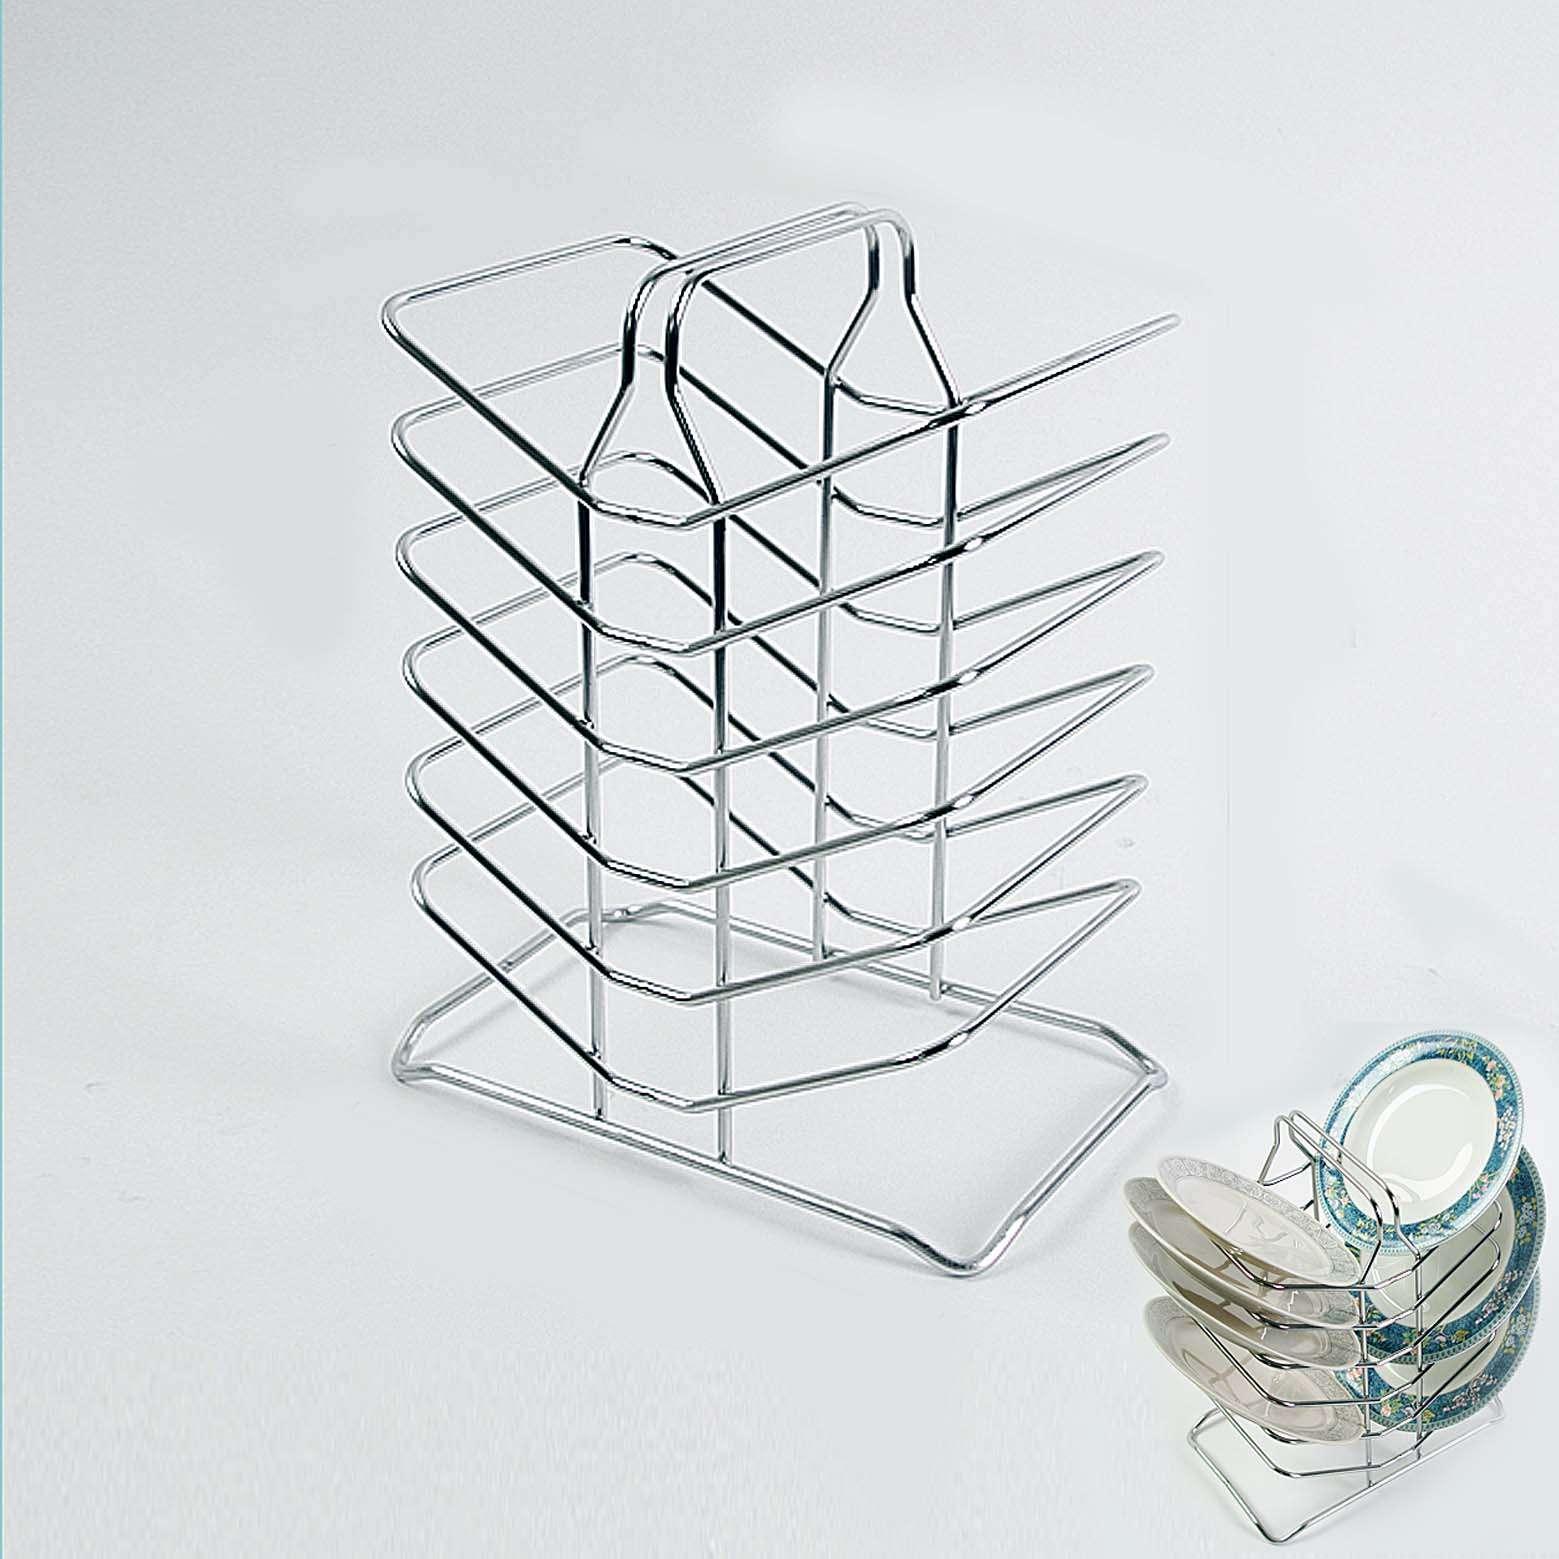 Stainless steel wire three stepped shelf kitchen organizer sink drying board ebay - Kitchen sink drying rack ...